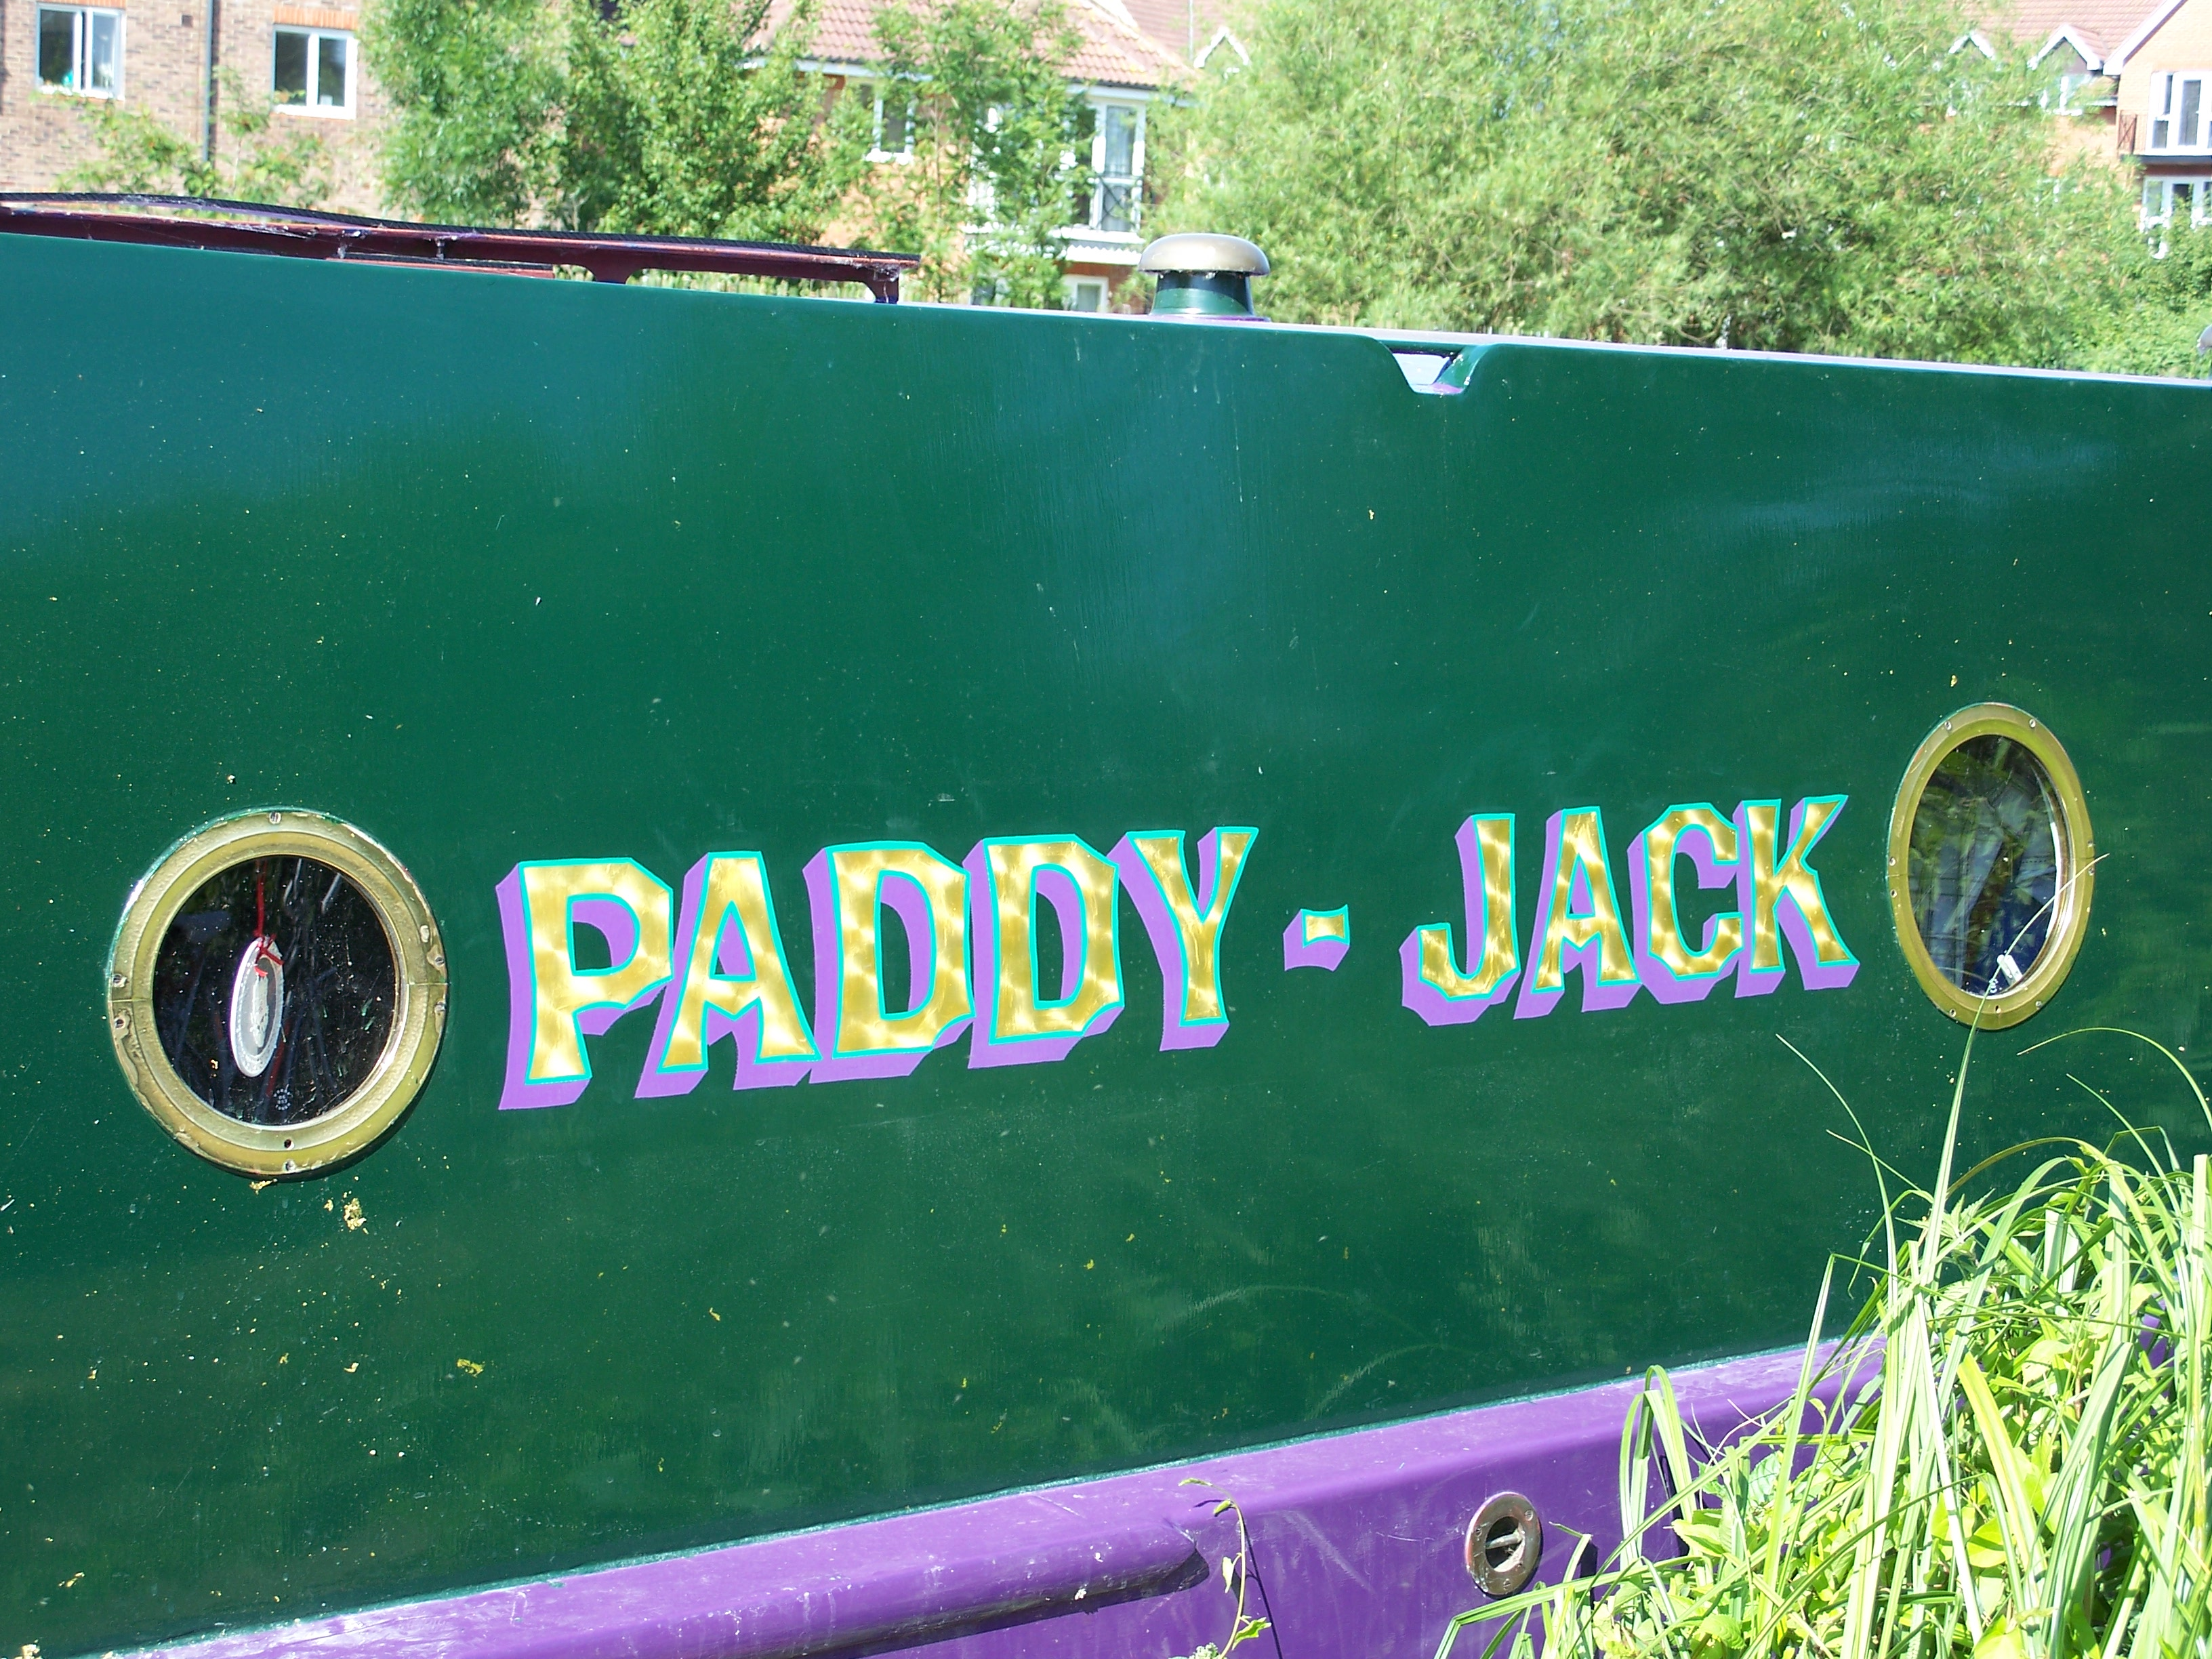 Paddy Jack